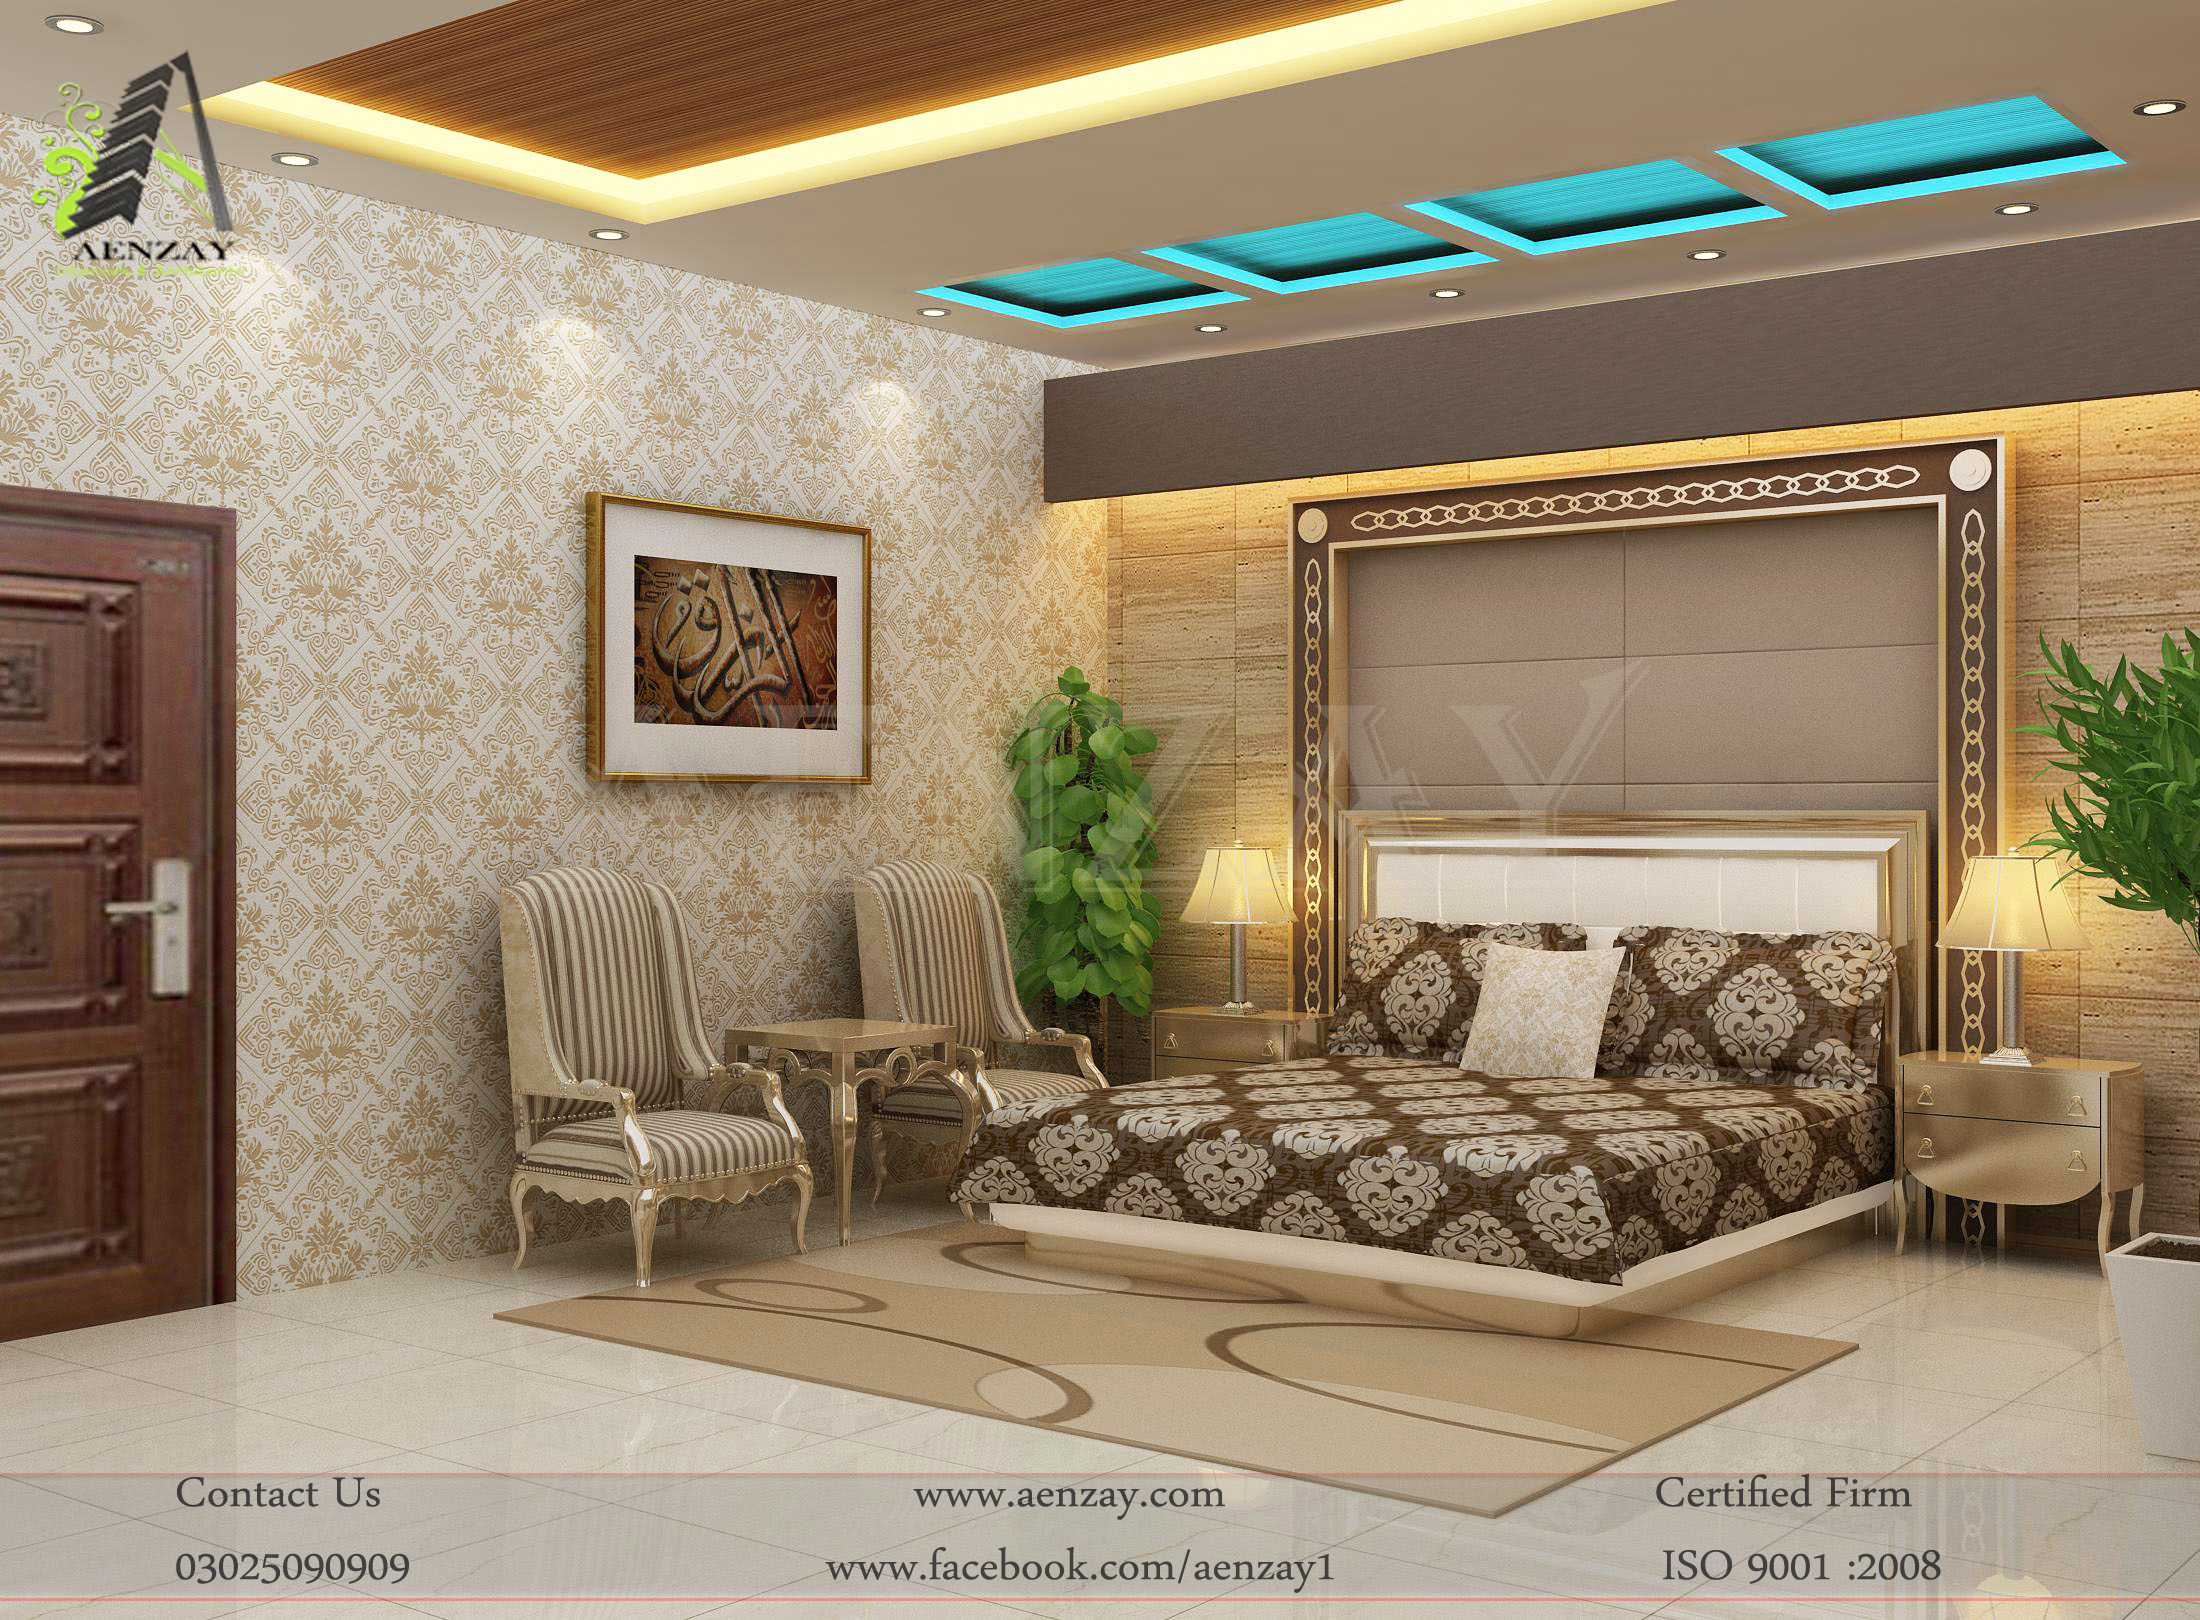 Bedroom Interior Aenzay Interiors Amp Architecture